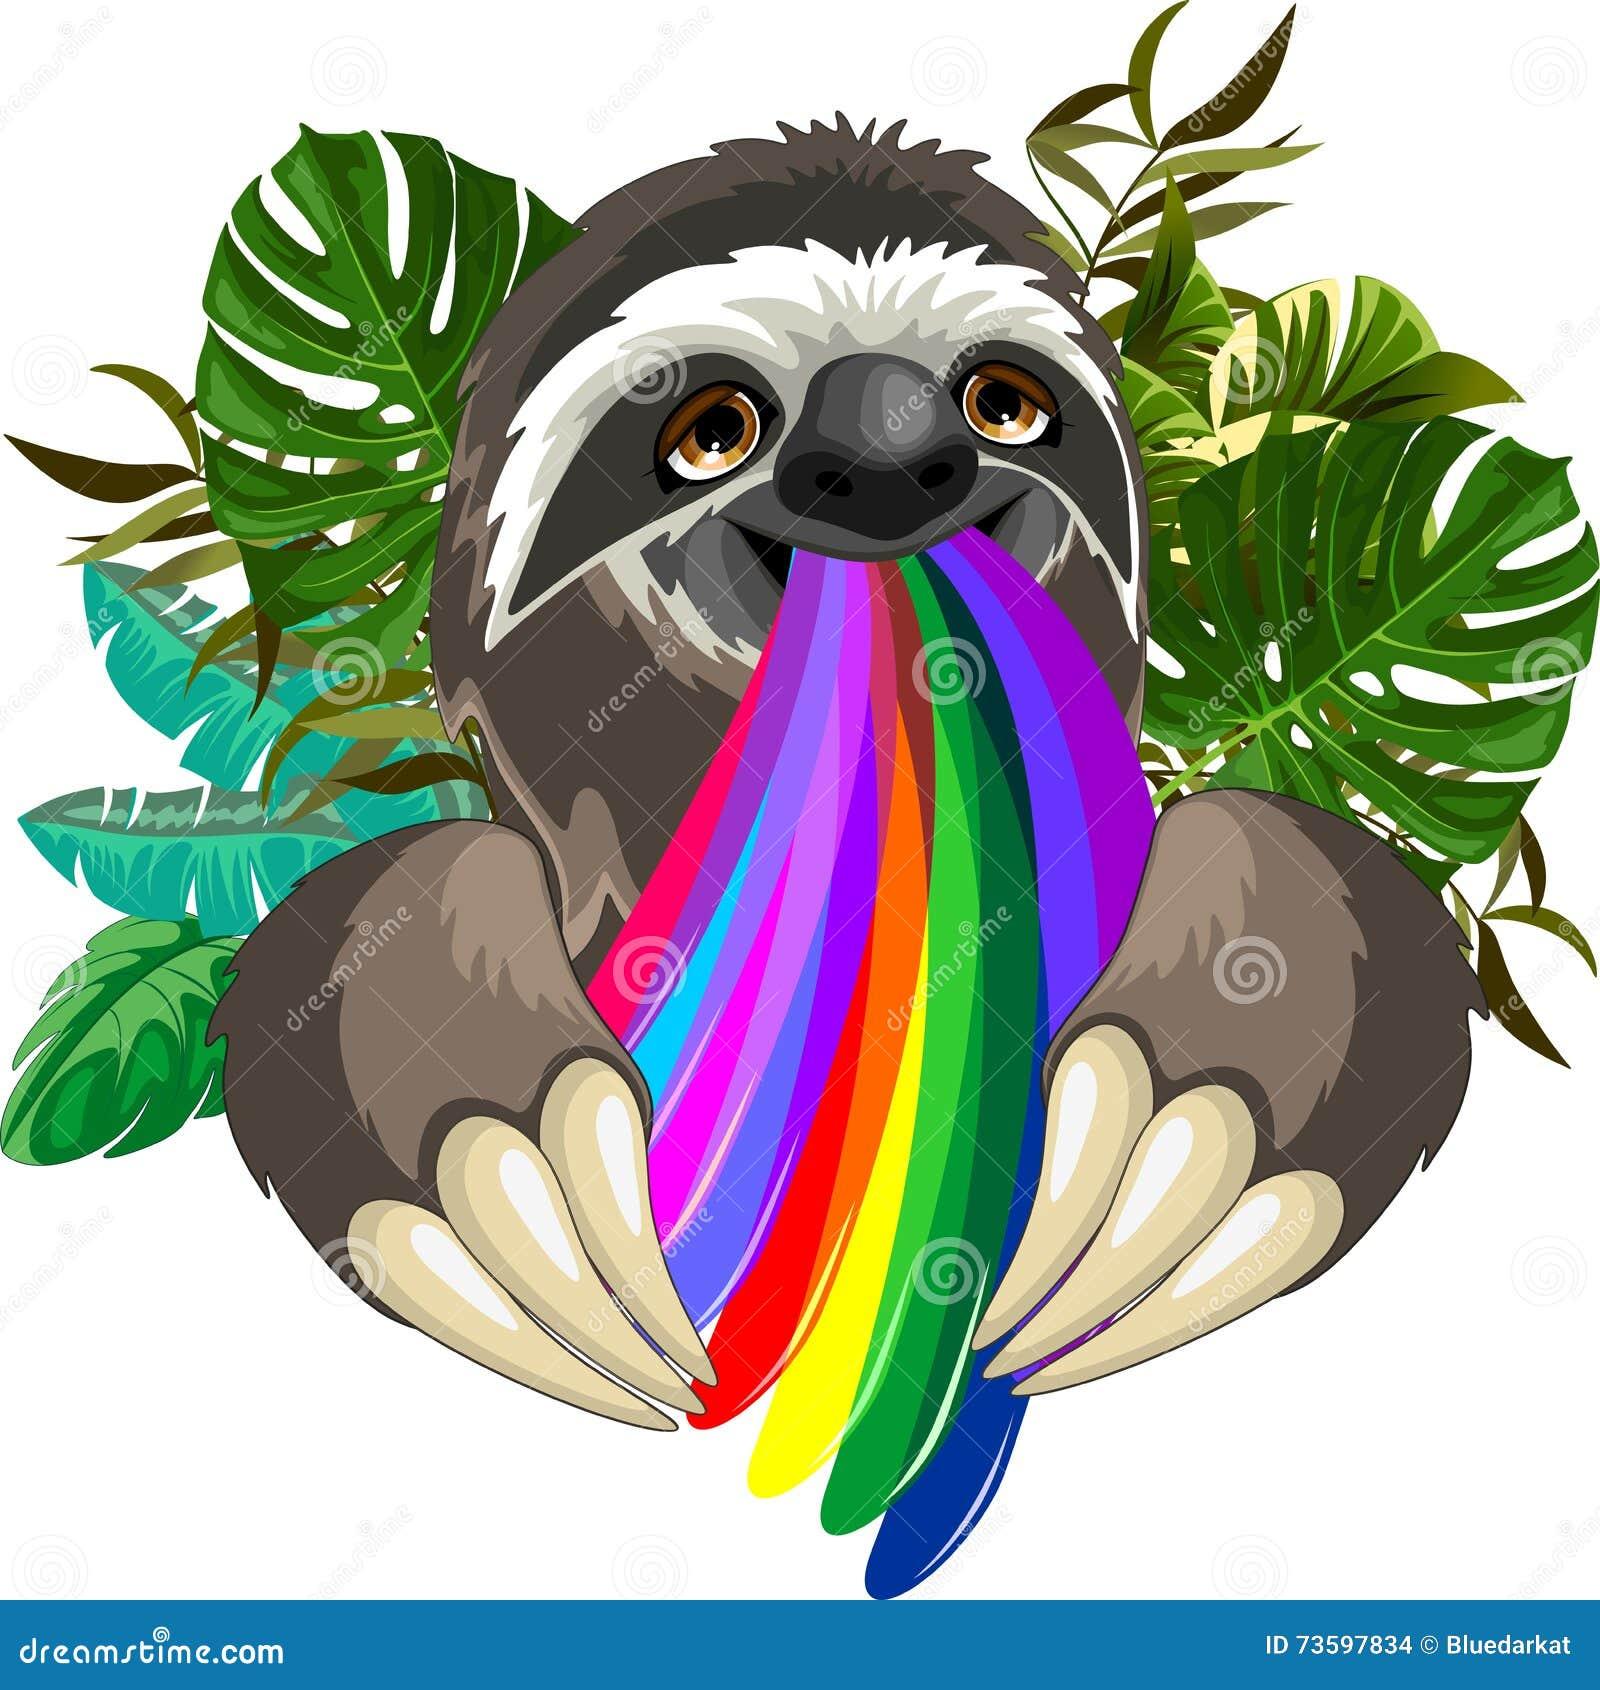 Sloth Spitting Rainbow Colors